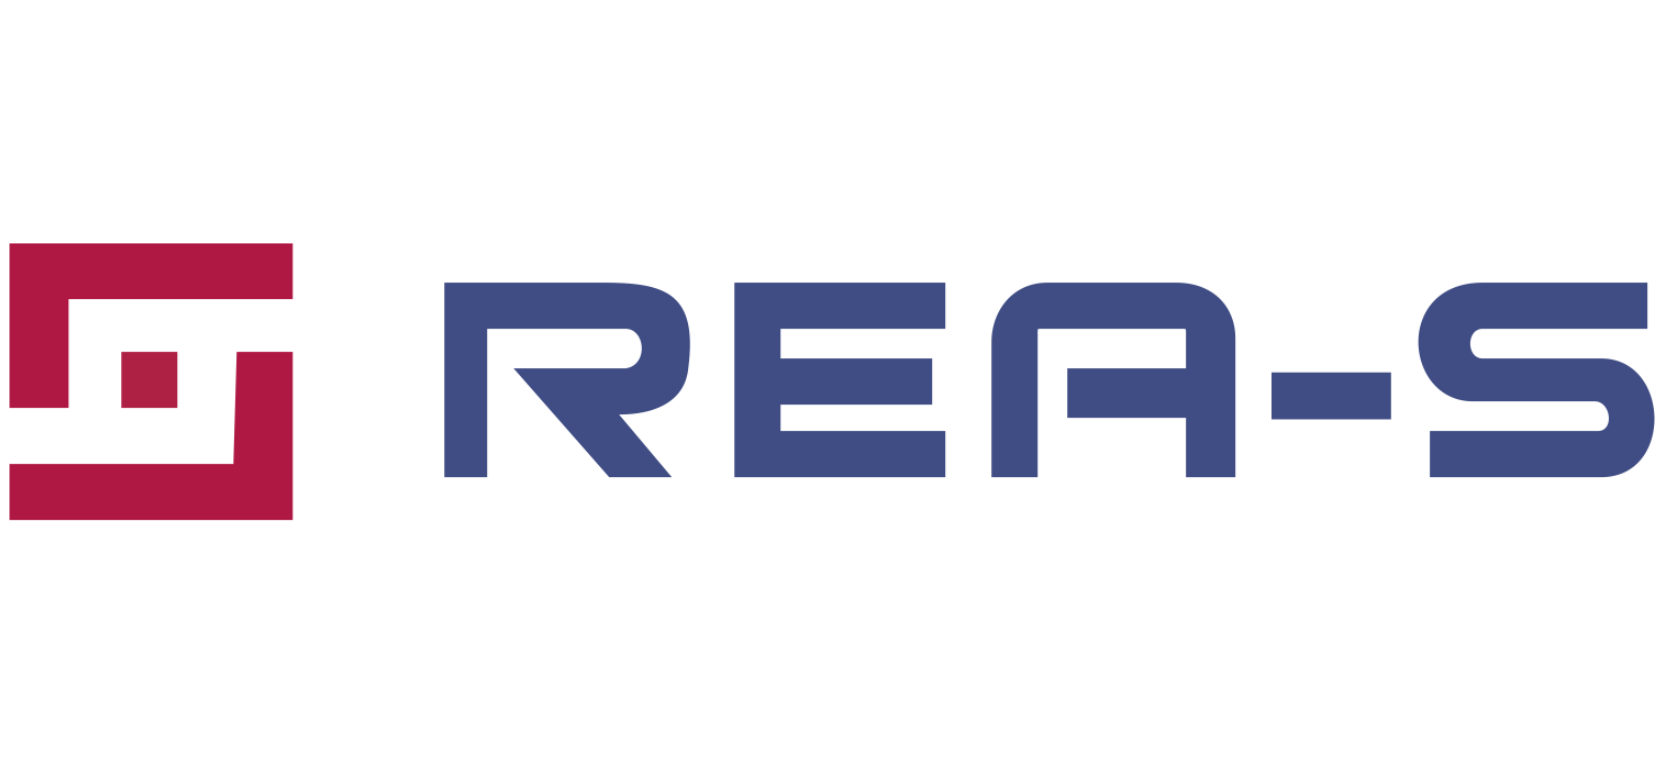 Rea-s obchod